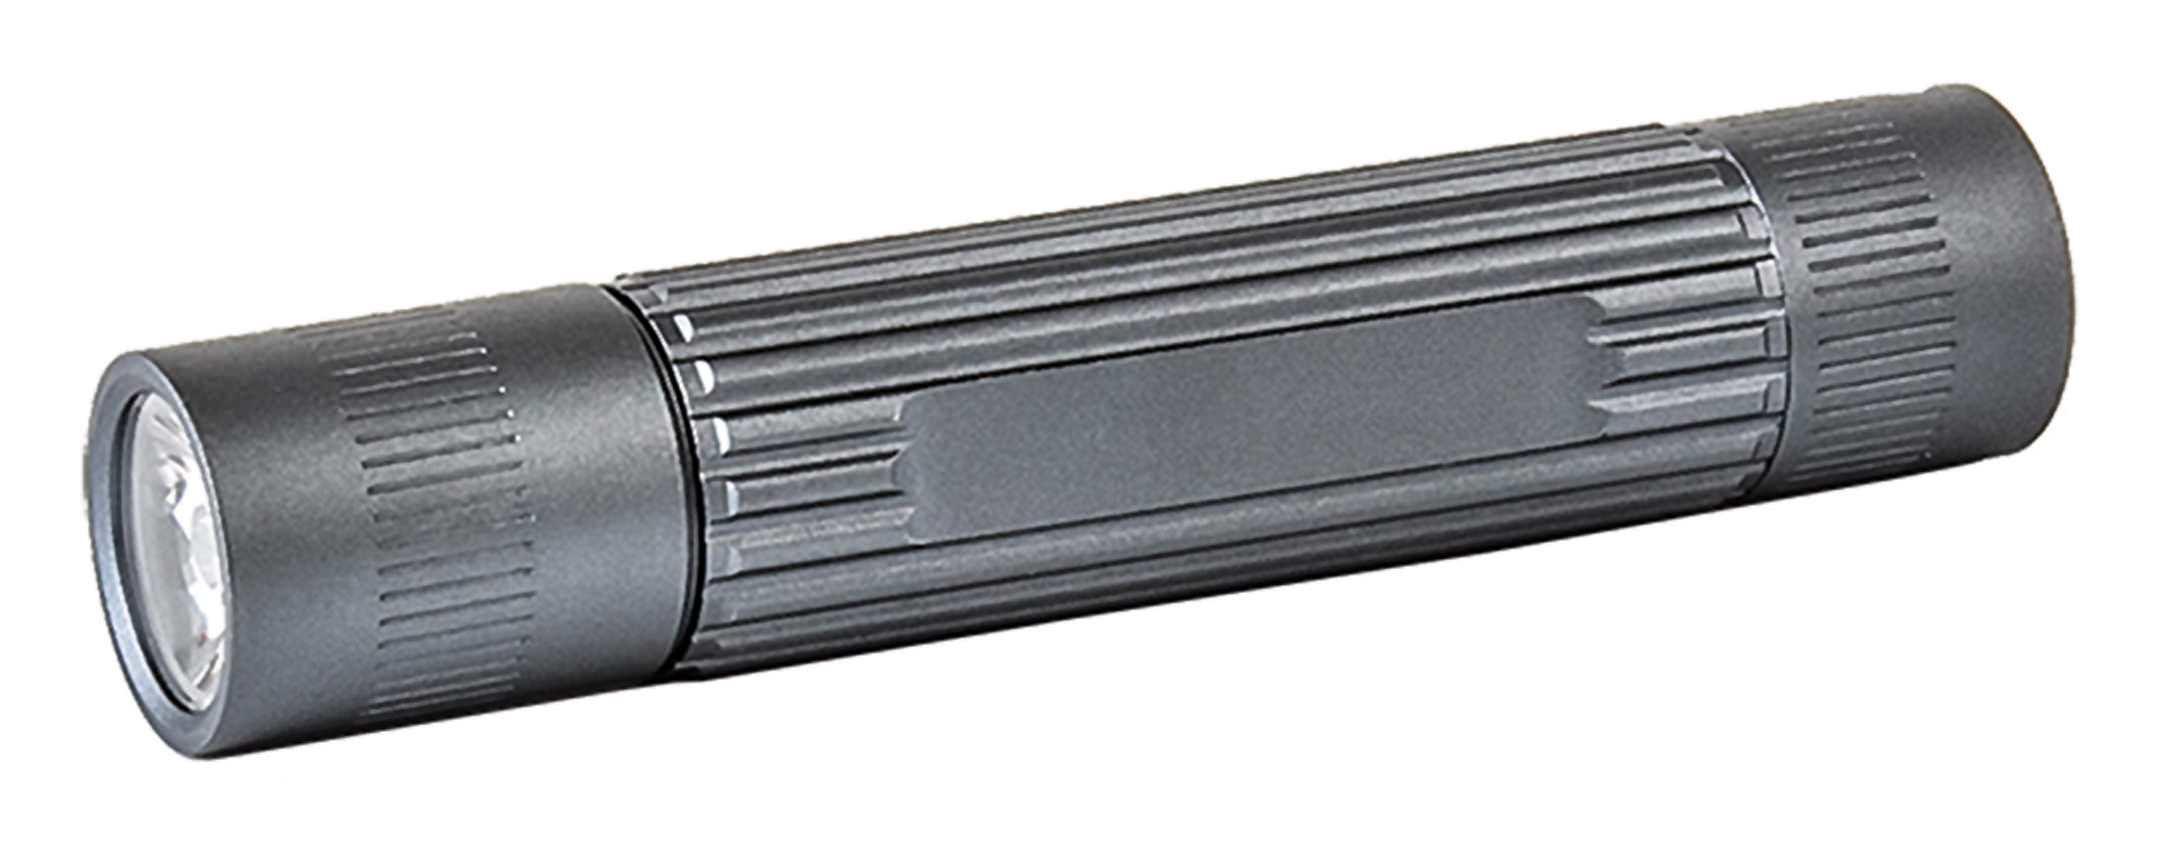 Taschenlampe Q1 mini LED 20// 80lm ++NEU+++ Suprabeam